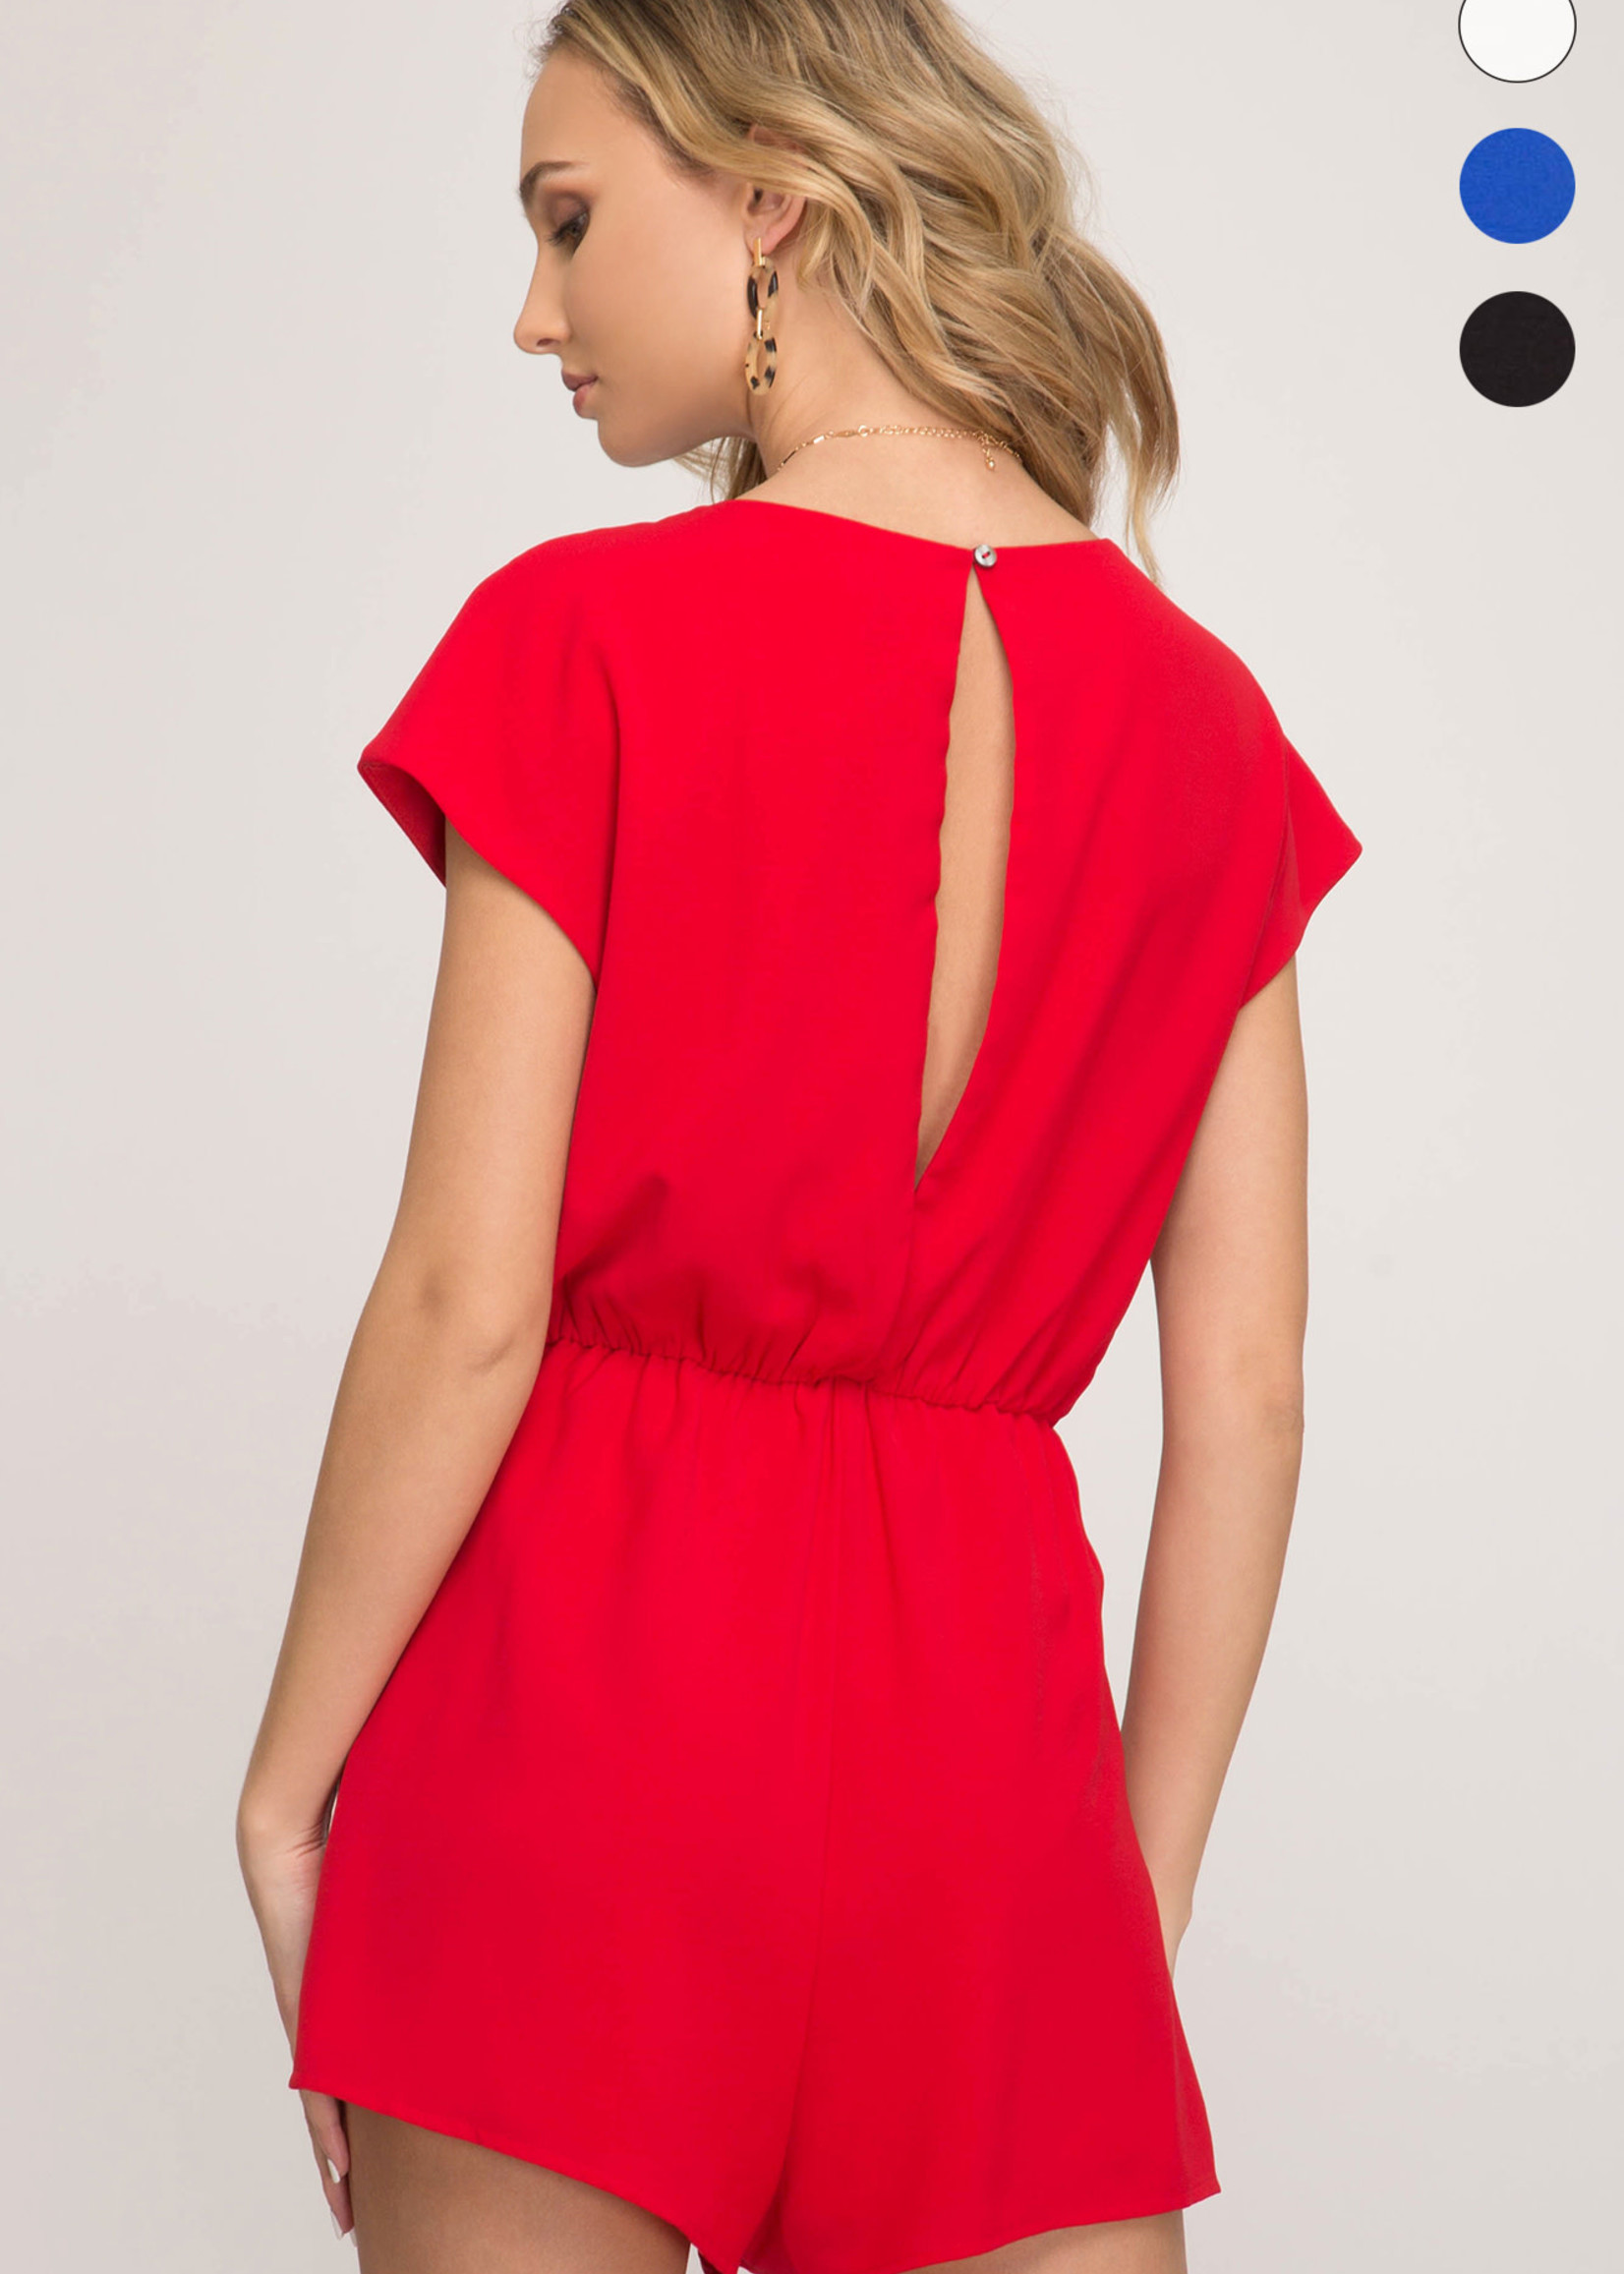 Drop Shoulder Shorts Romper w/ Front Tie